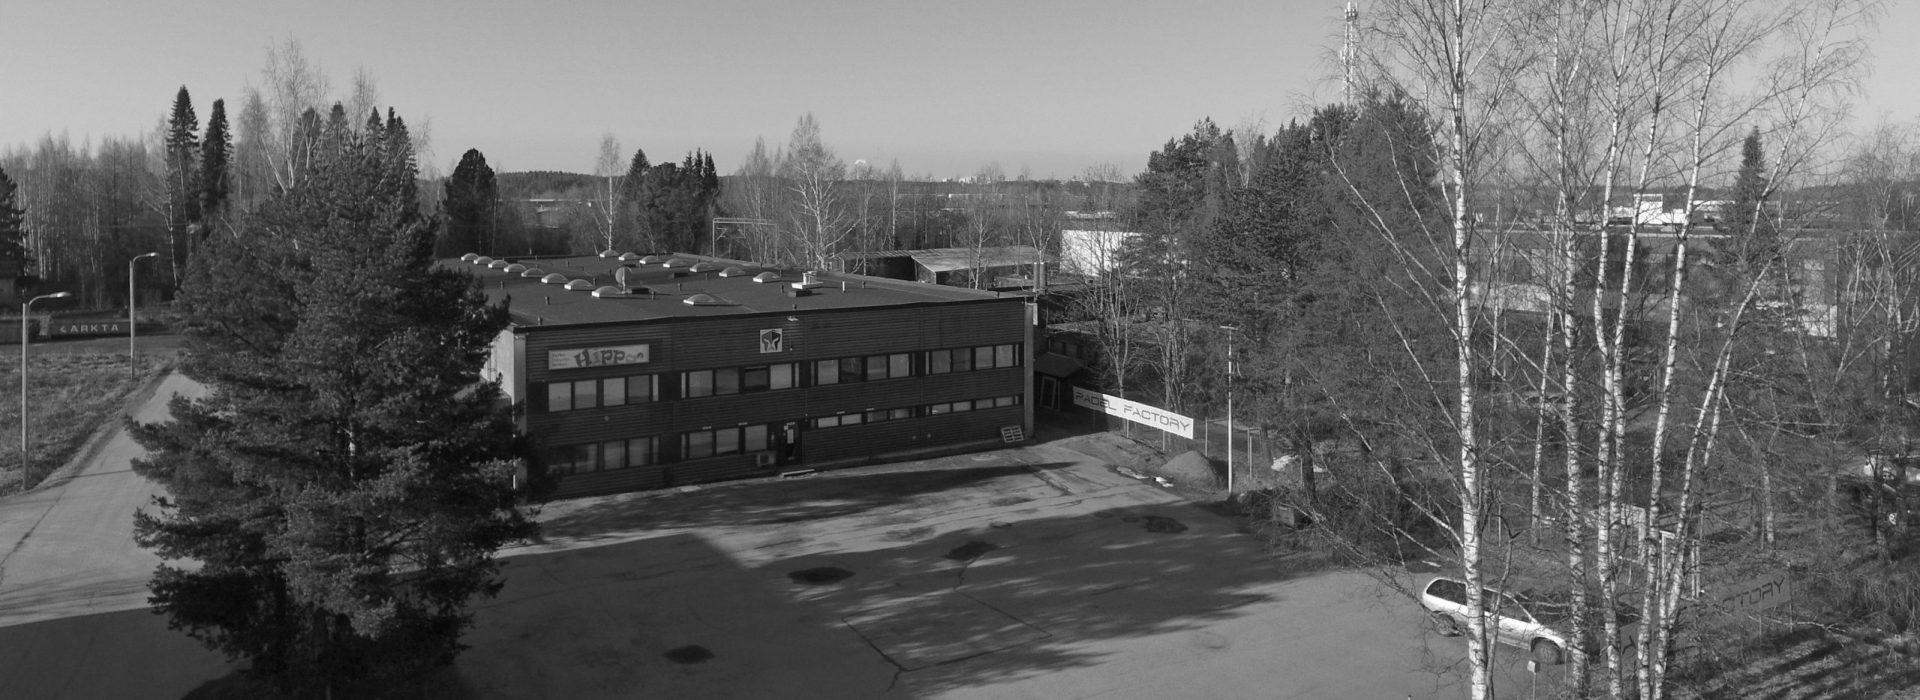 Padel Factory Tampere - Vestonkulma 2 • 33580 Tampere